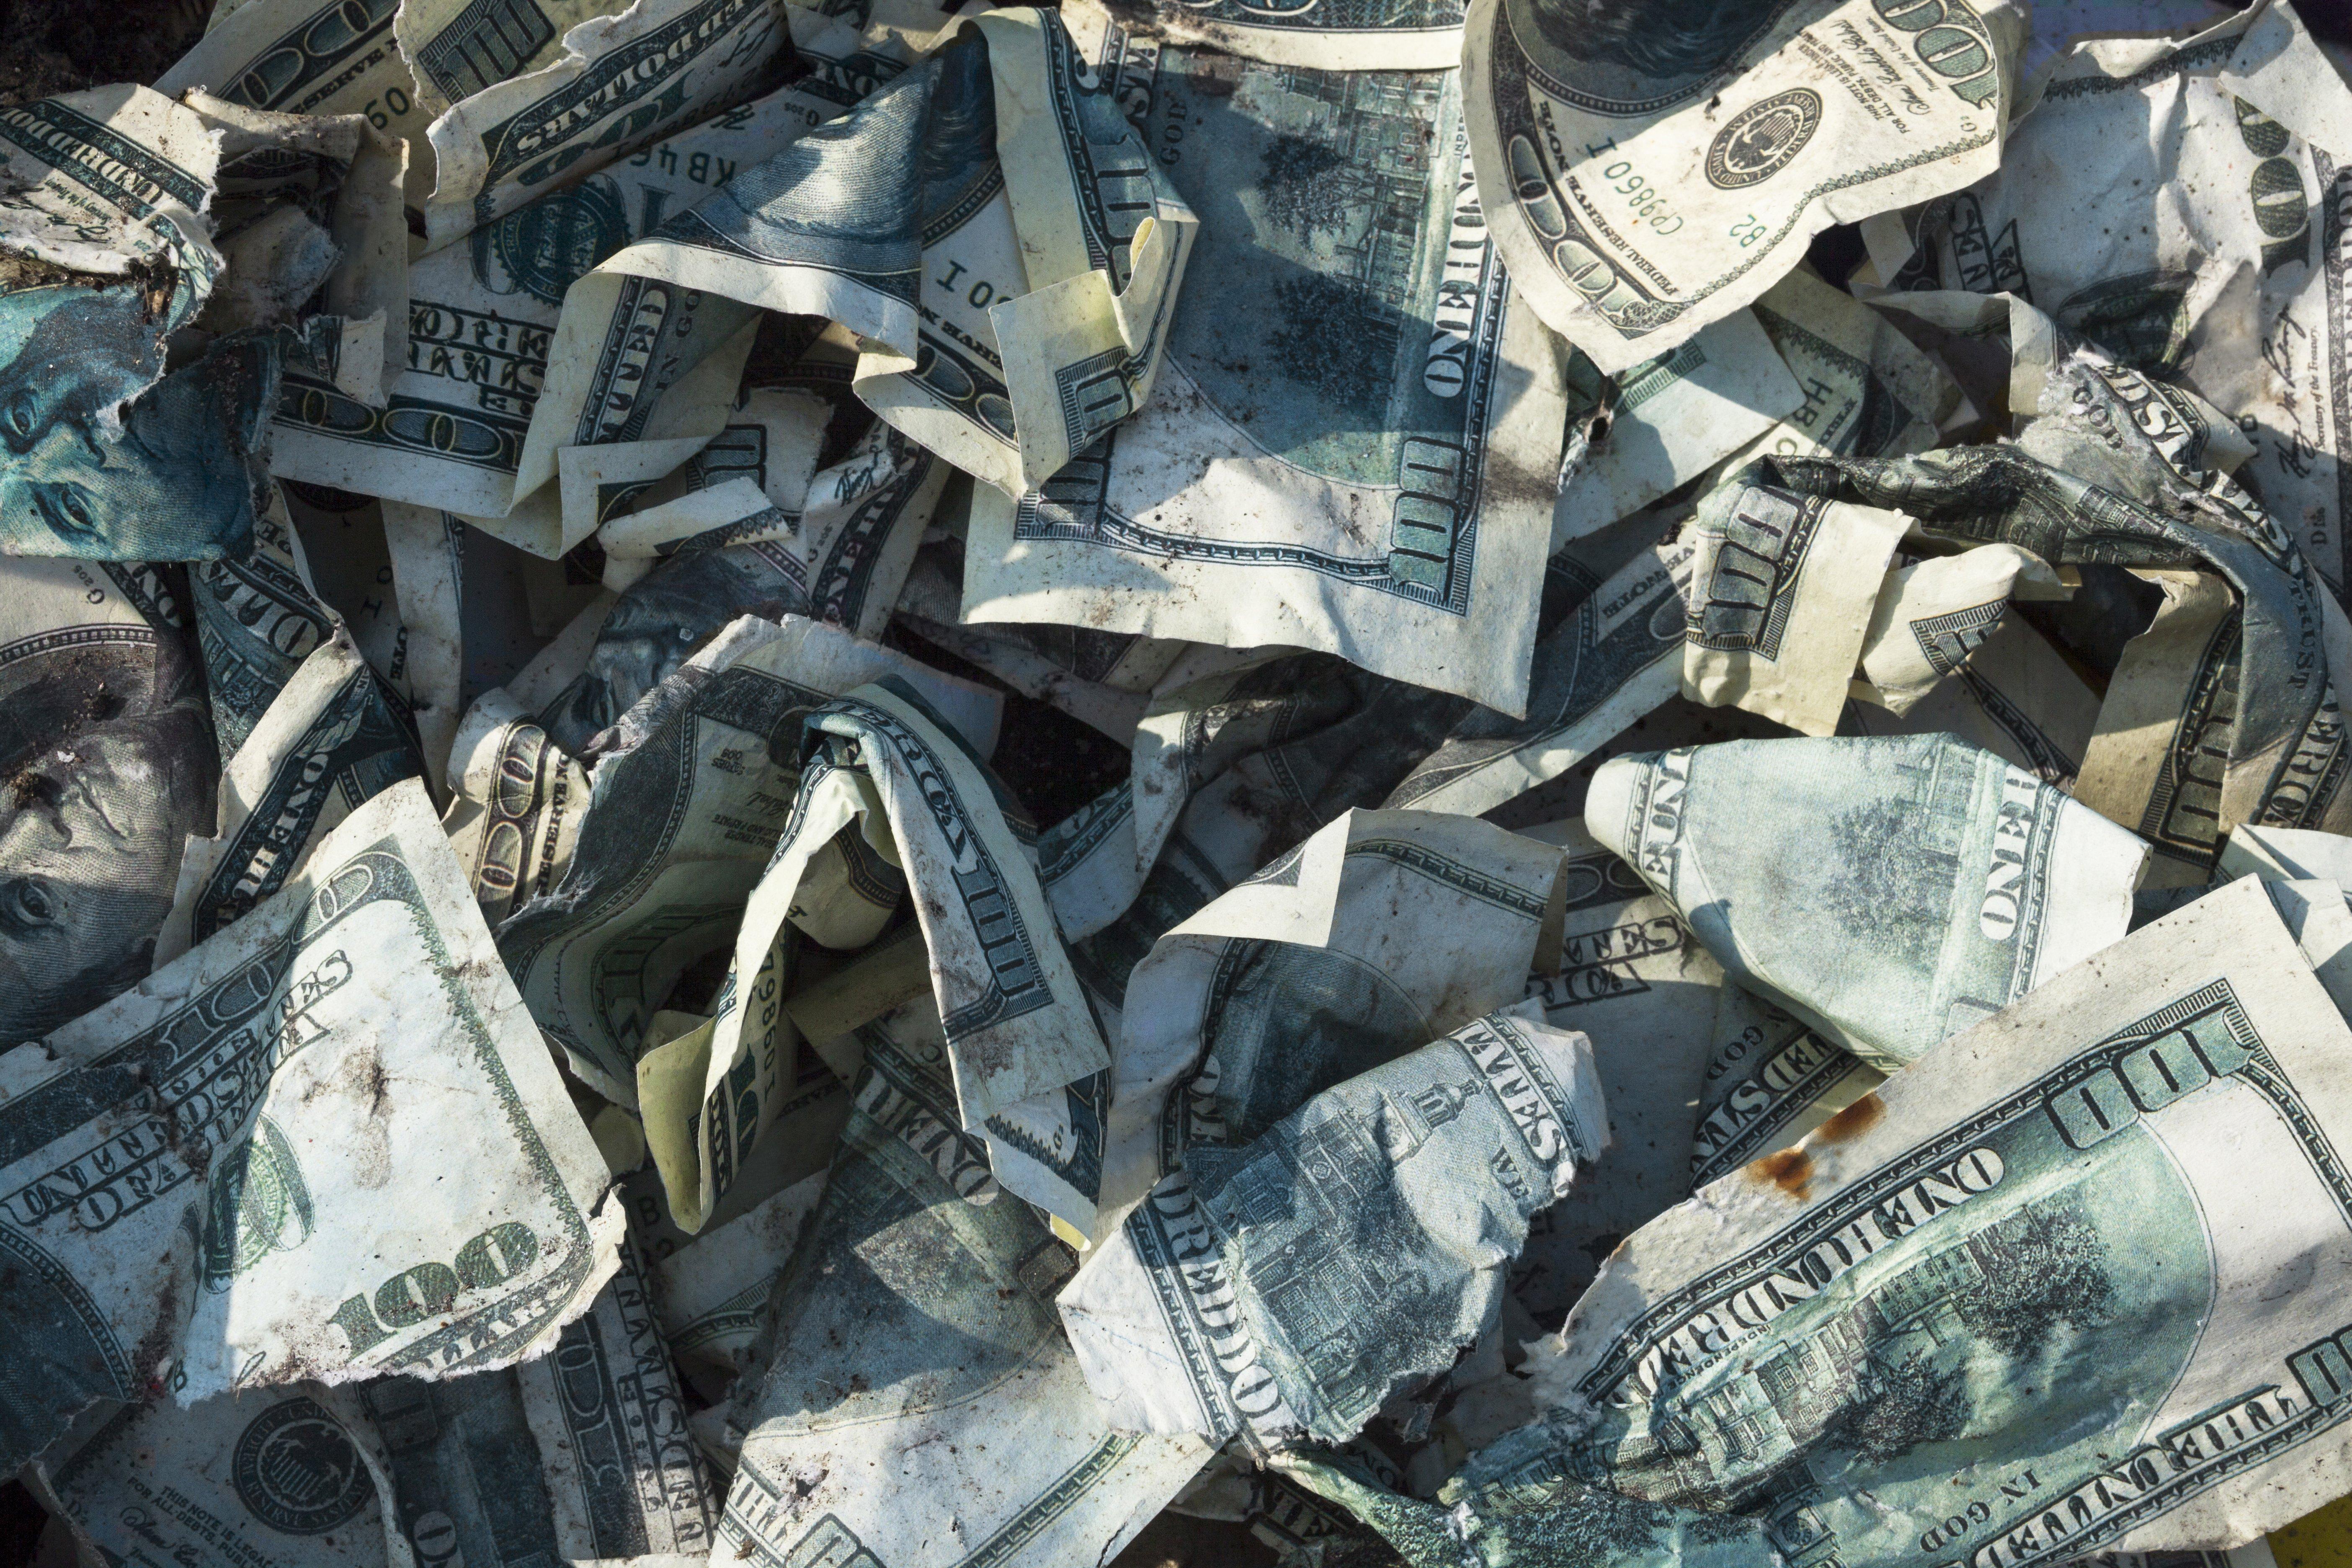 Bunch of crumpled up bills | Photo: Shutterstock